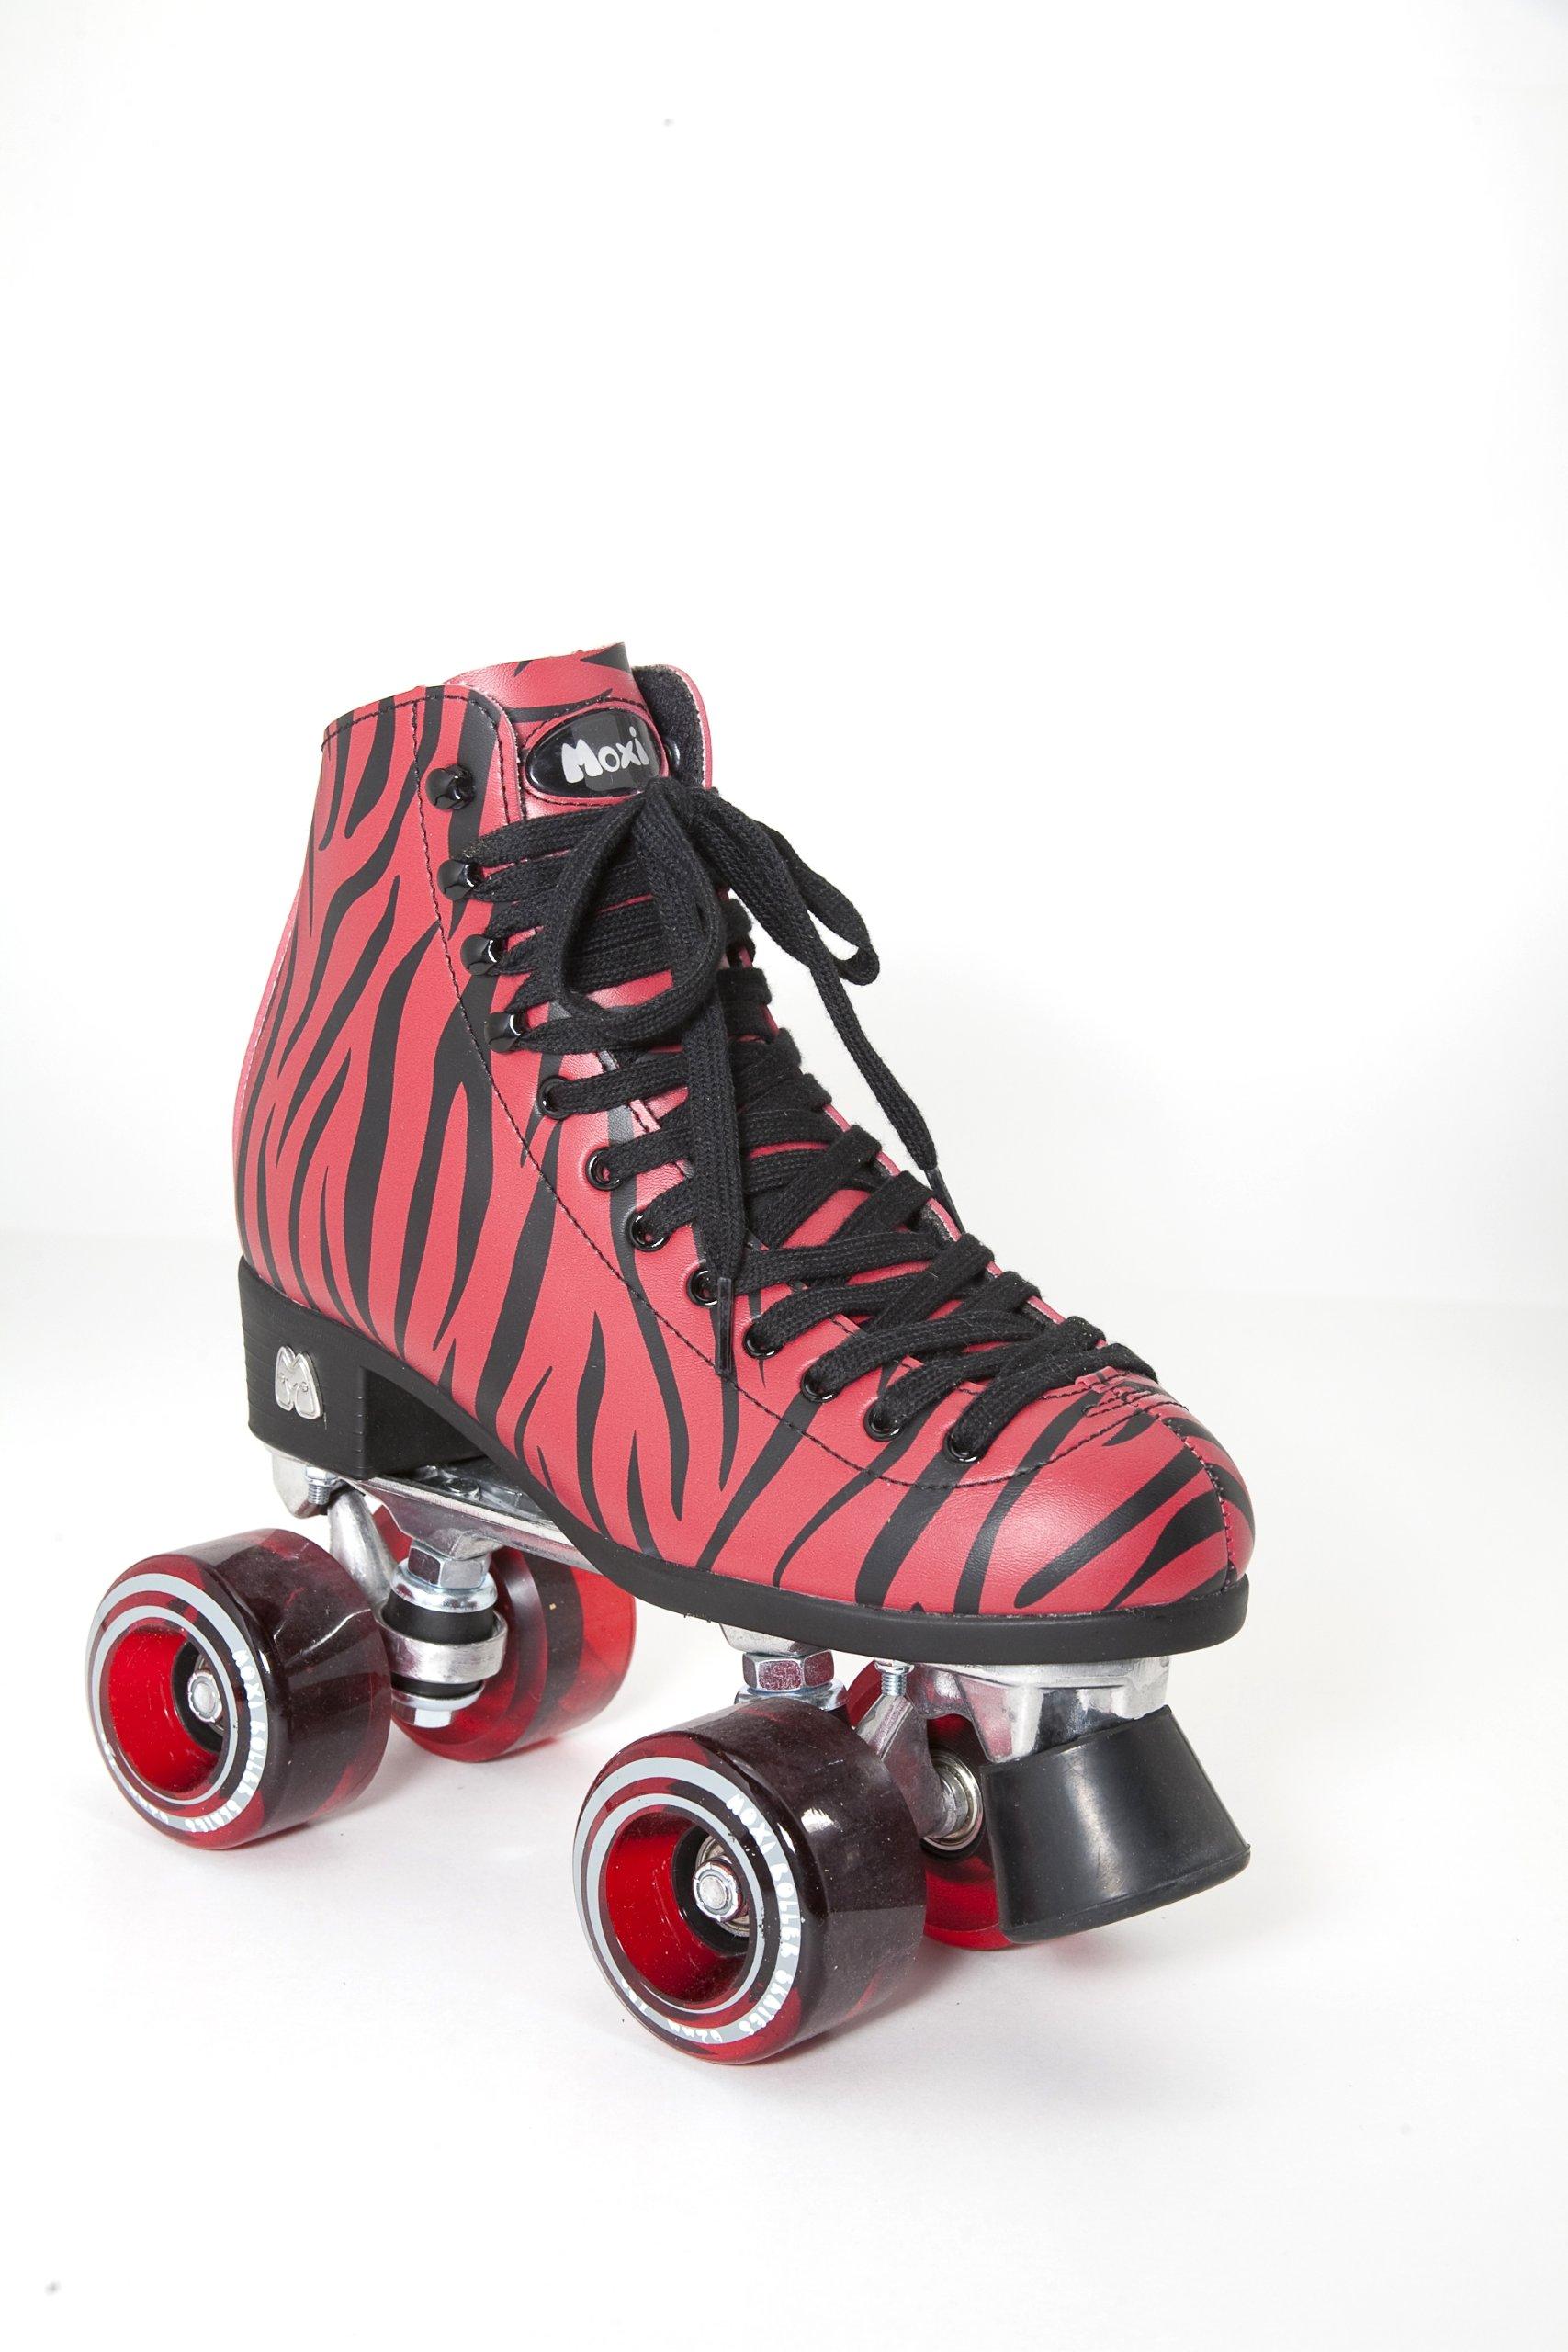 Moxi Roller Skates Ivy Roller Skates,Red Zebra,5